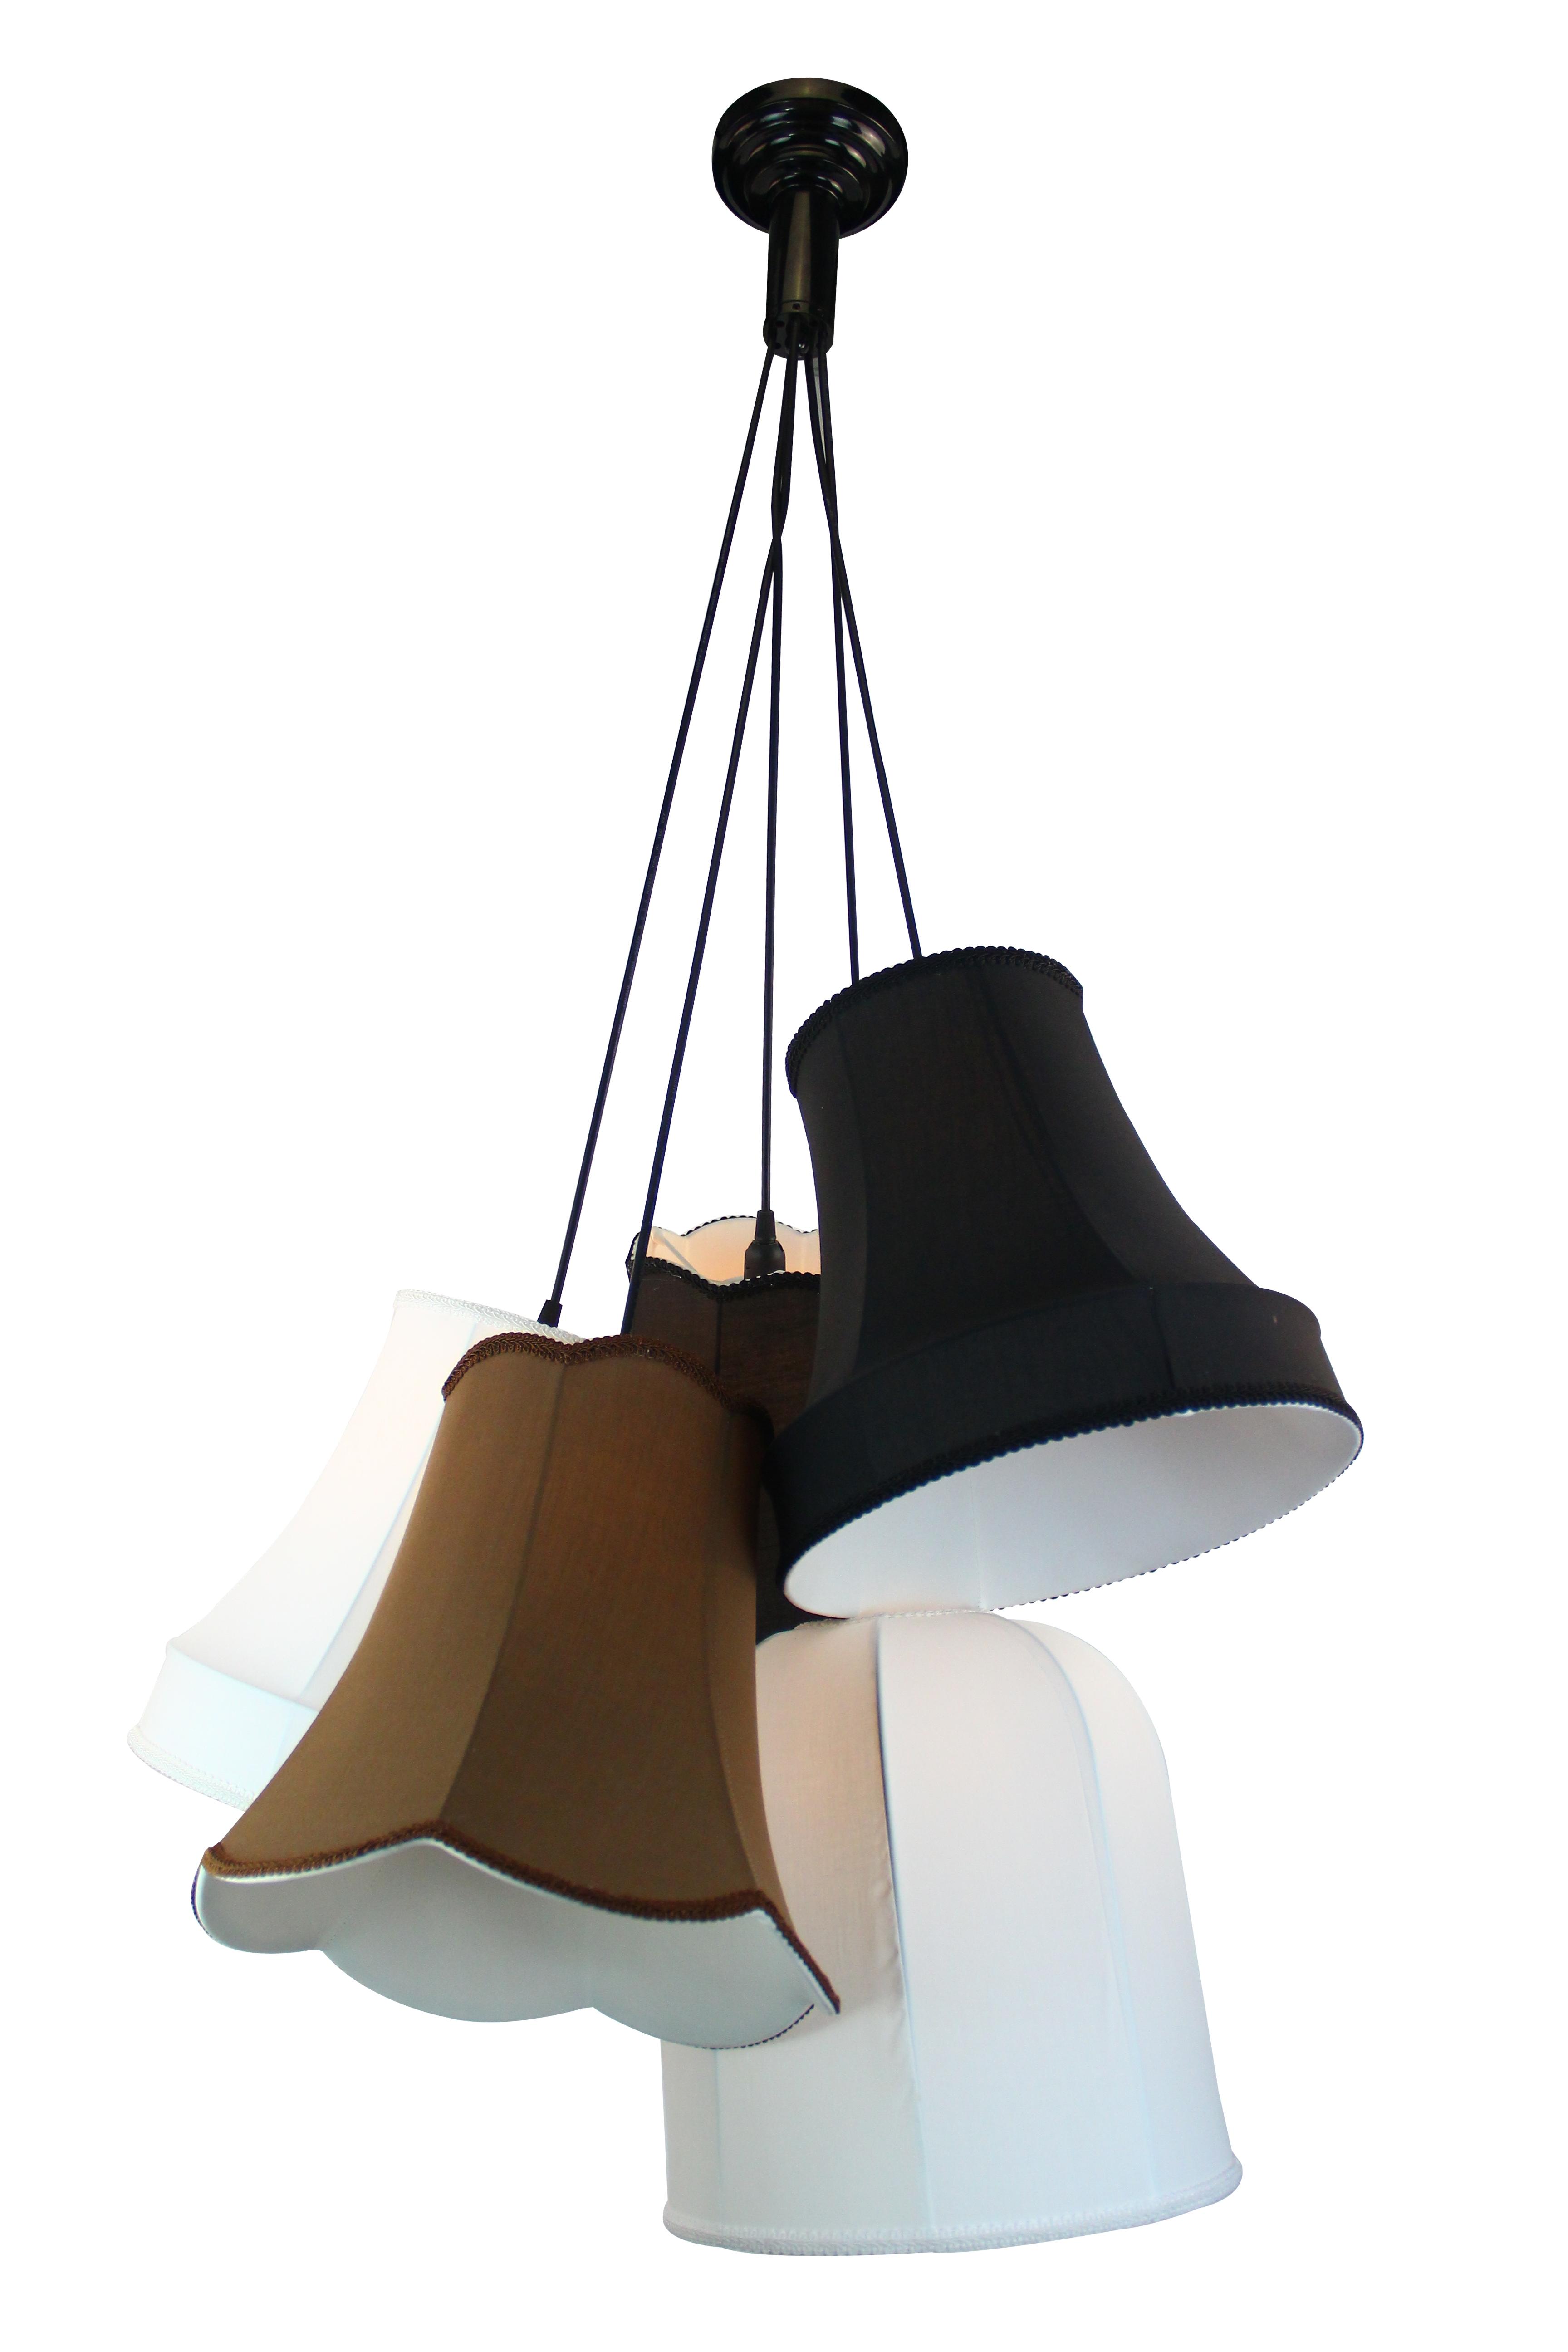 Люстра Lamplandia 9212-5 ella люстра lamplandia daria 3х40вт е14 металл темно коричневый